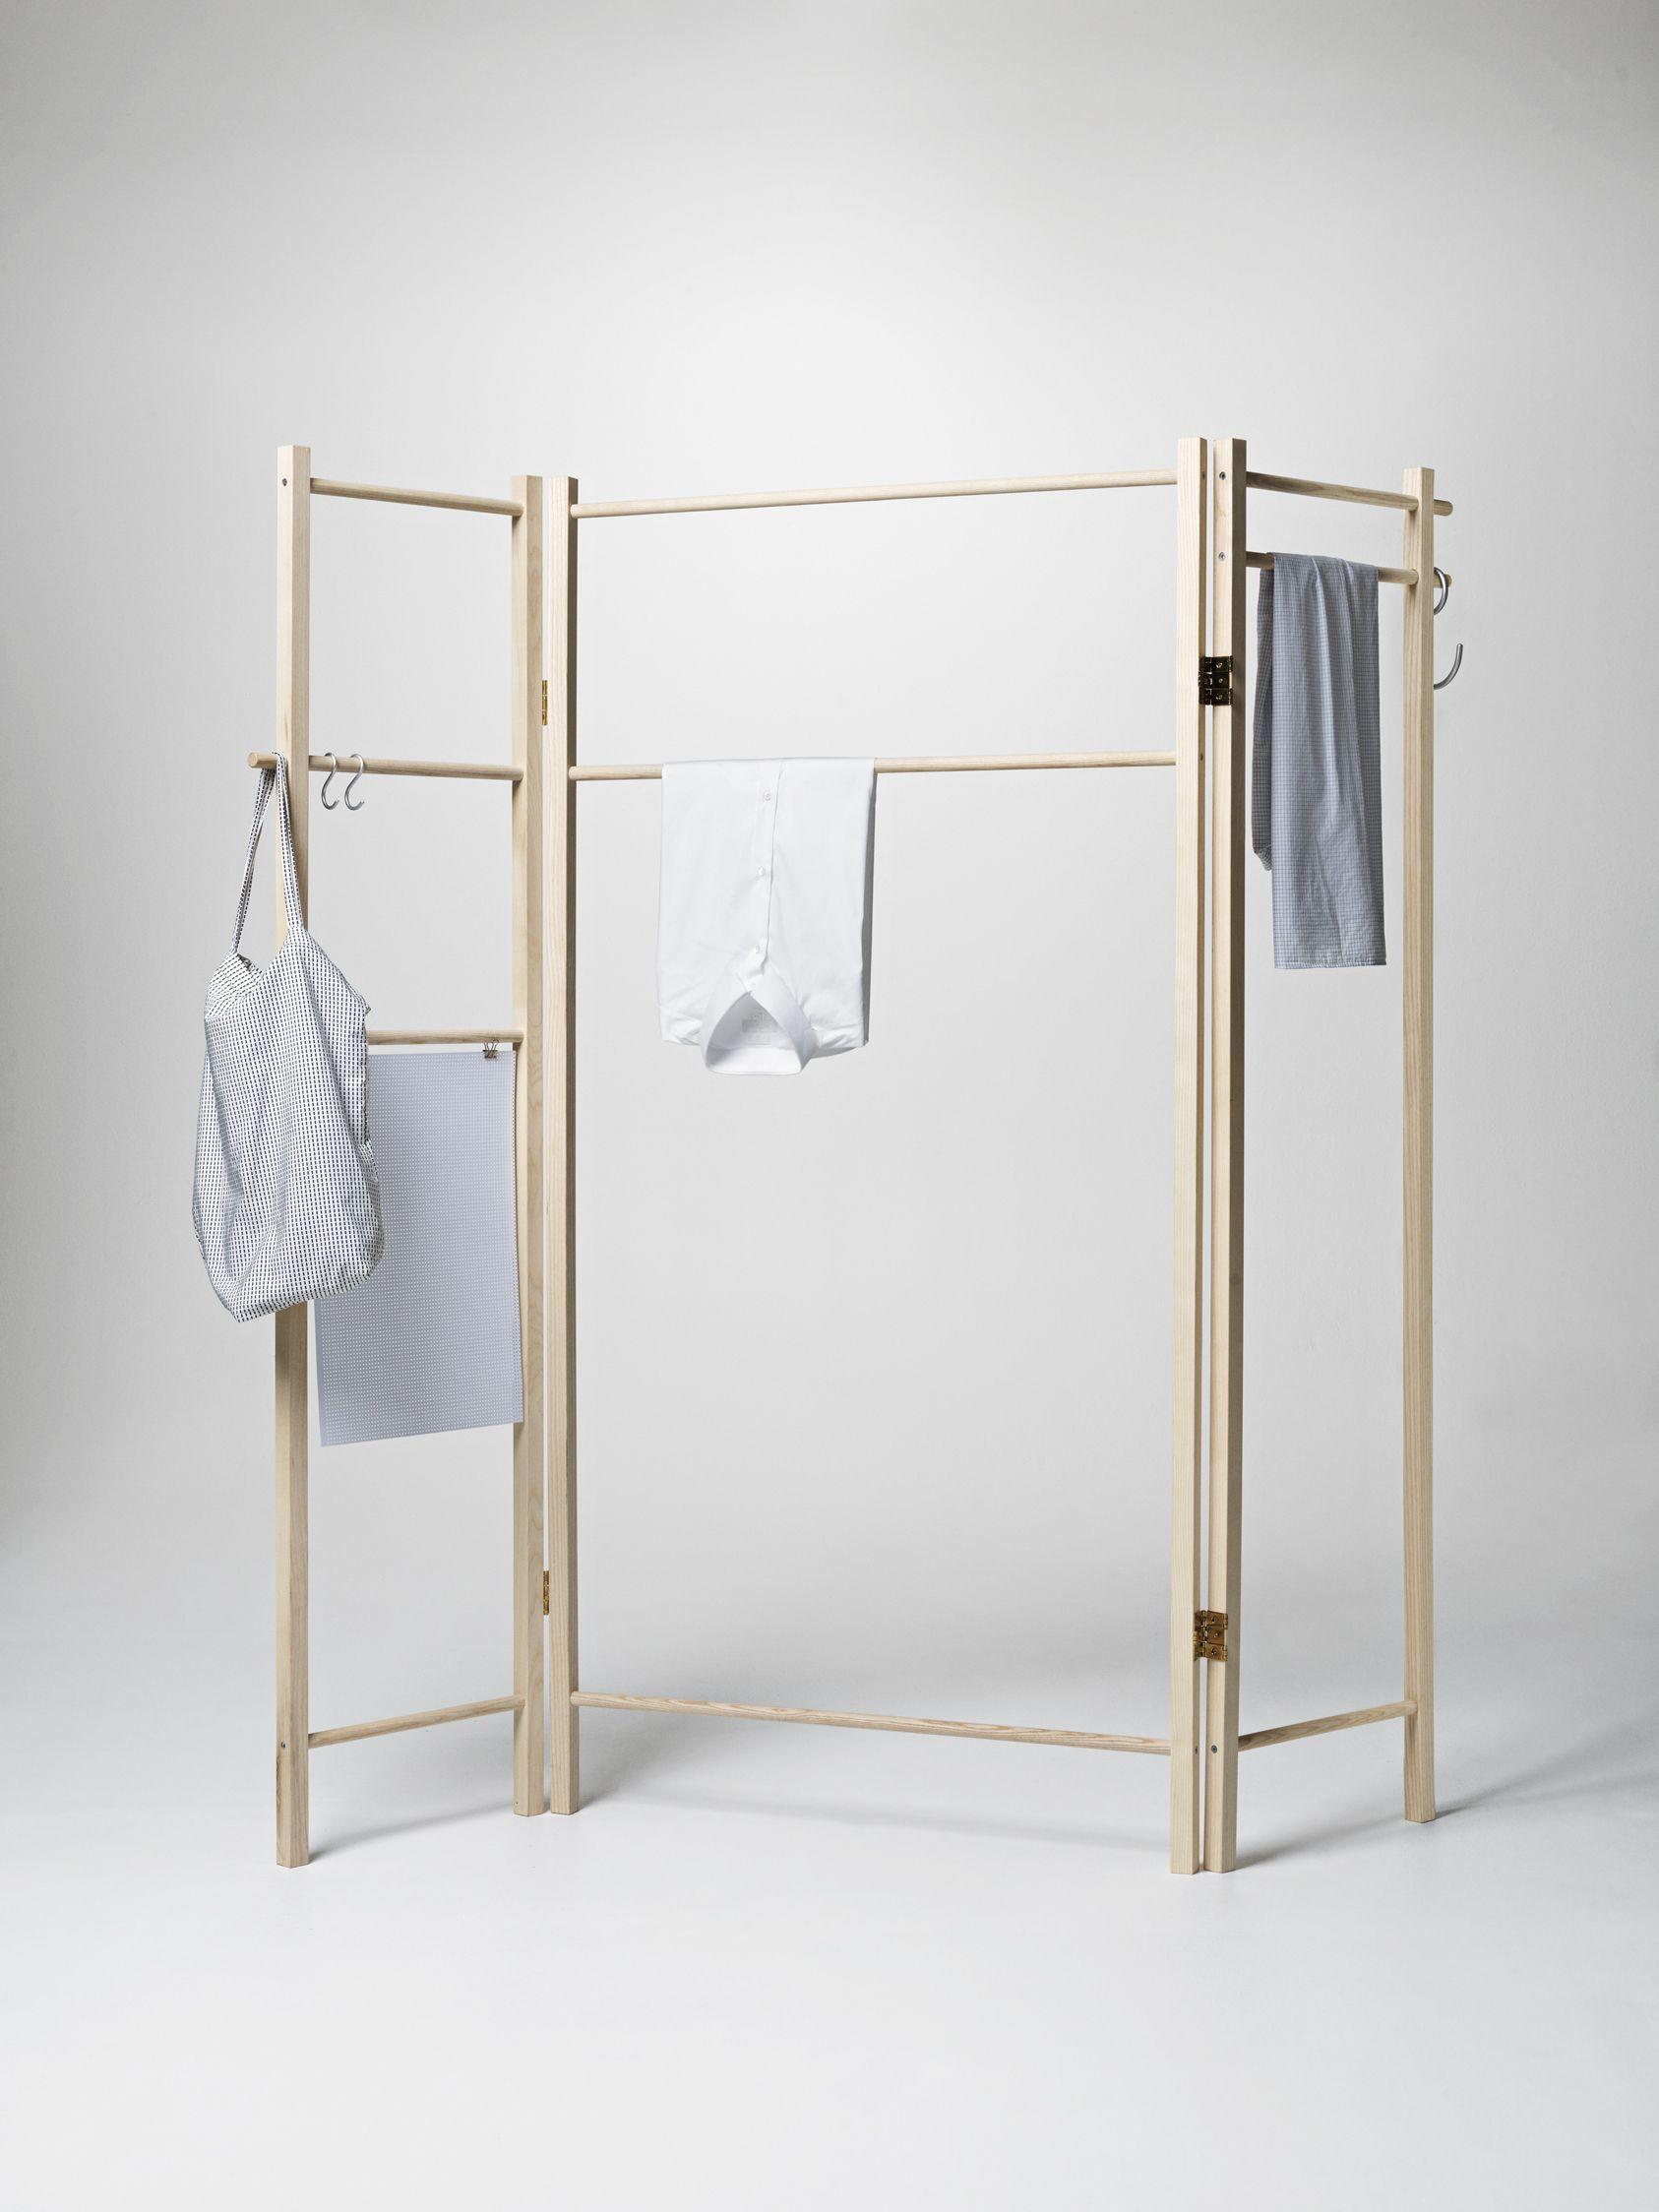 360 Degrees Foldable Garment Rack   Furniture . Möbel . Meubles   Design:  Anonym Design   Nomess  